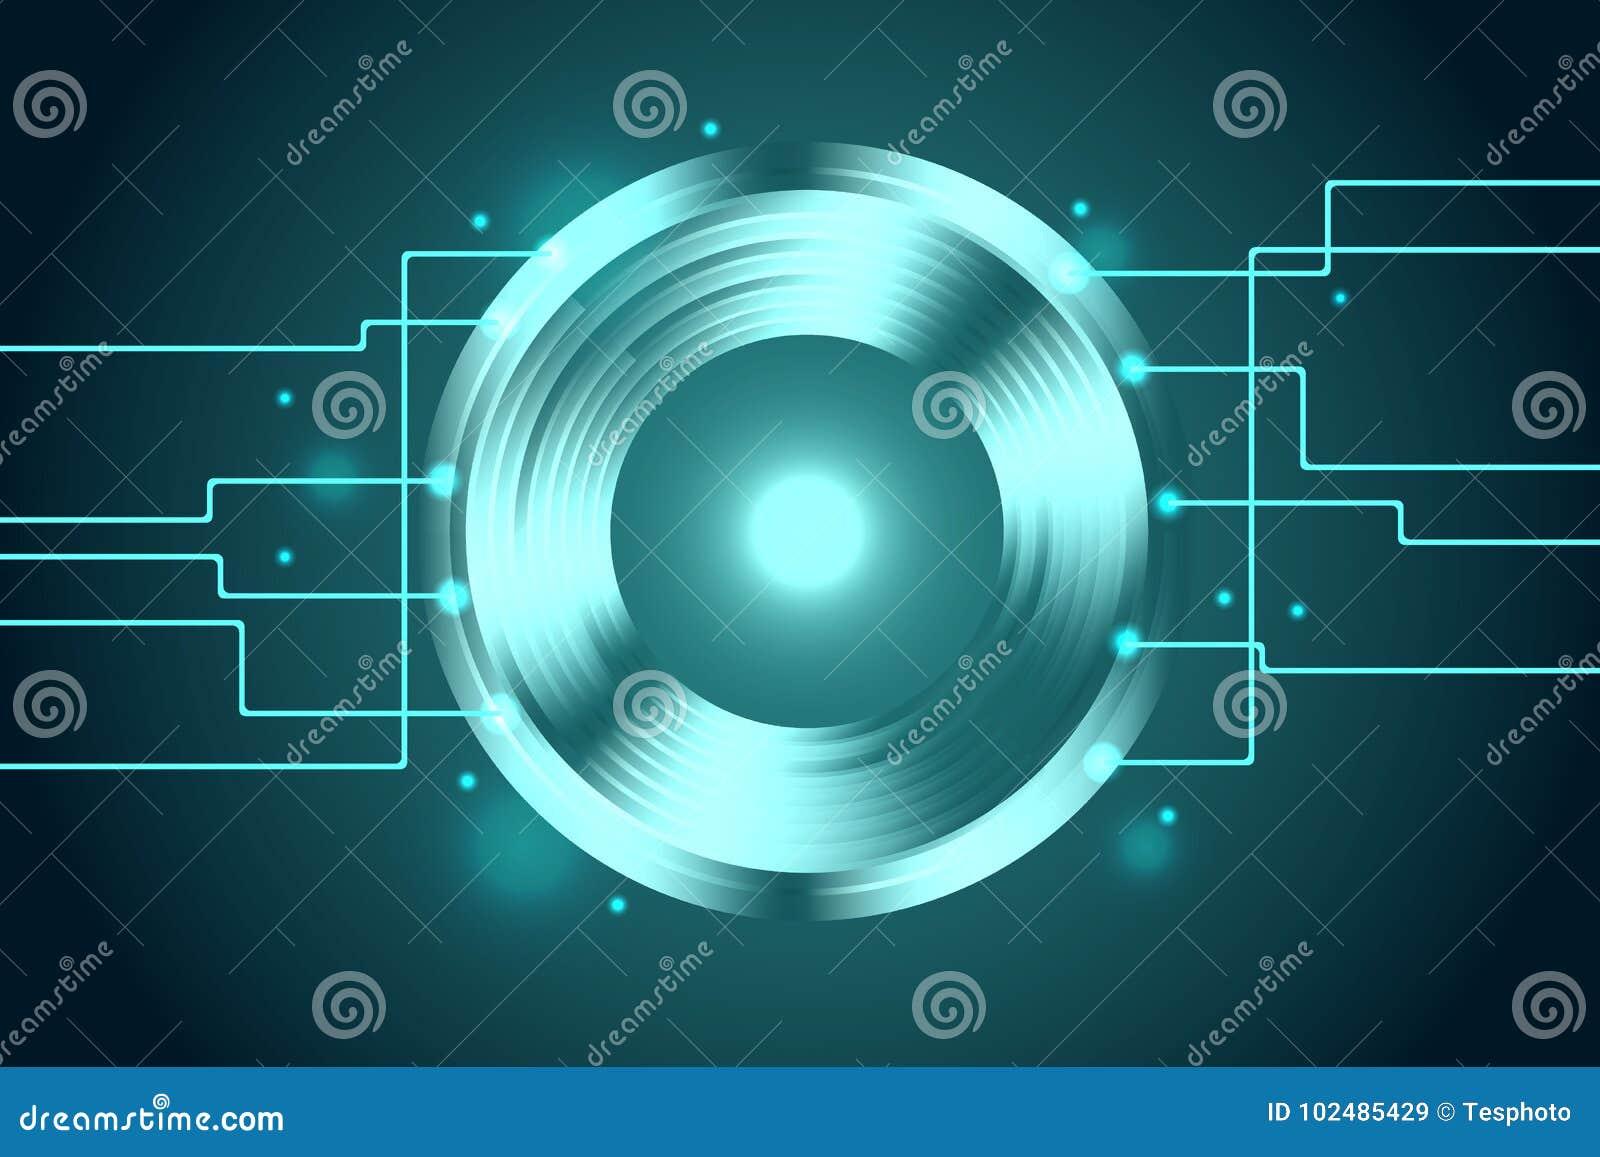 Abstract Technology Background Data Transfer Vector Illustr Stock